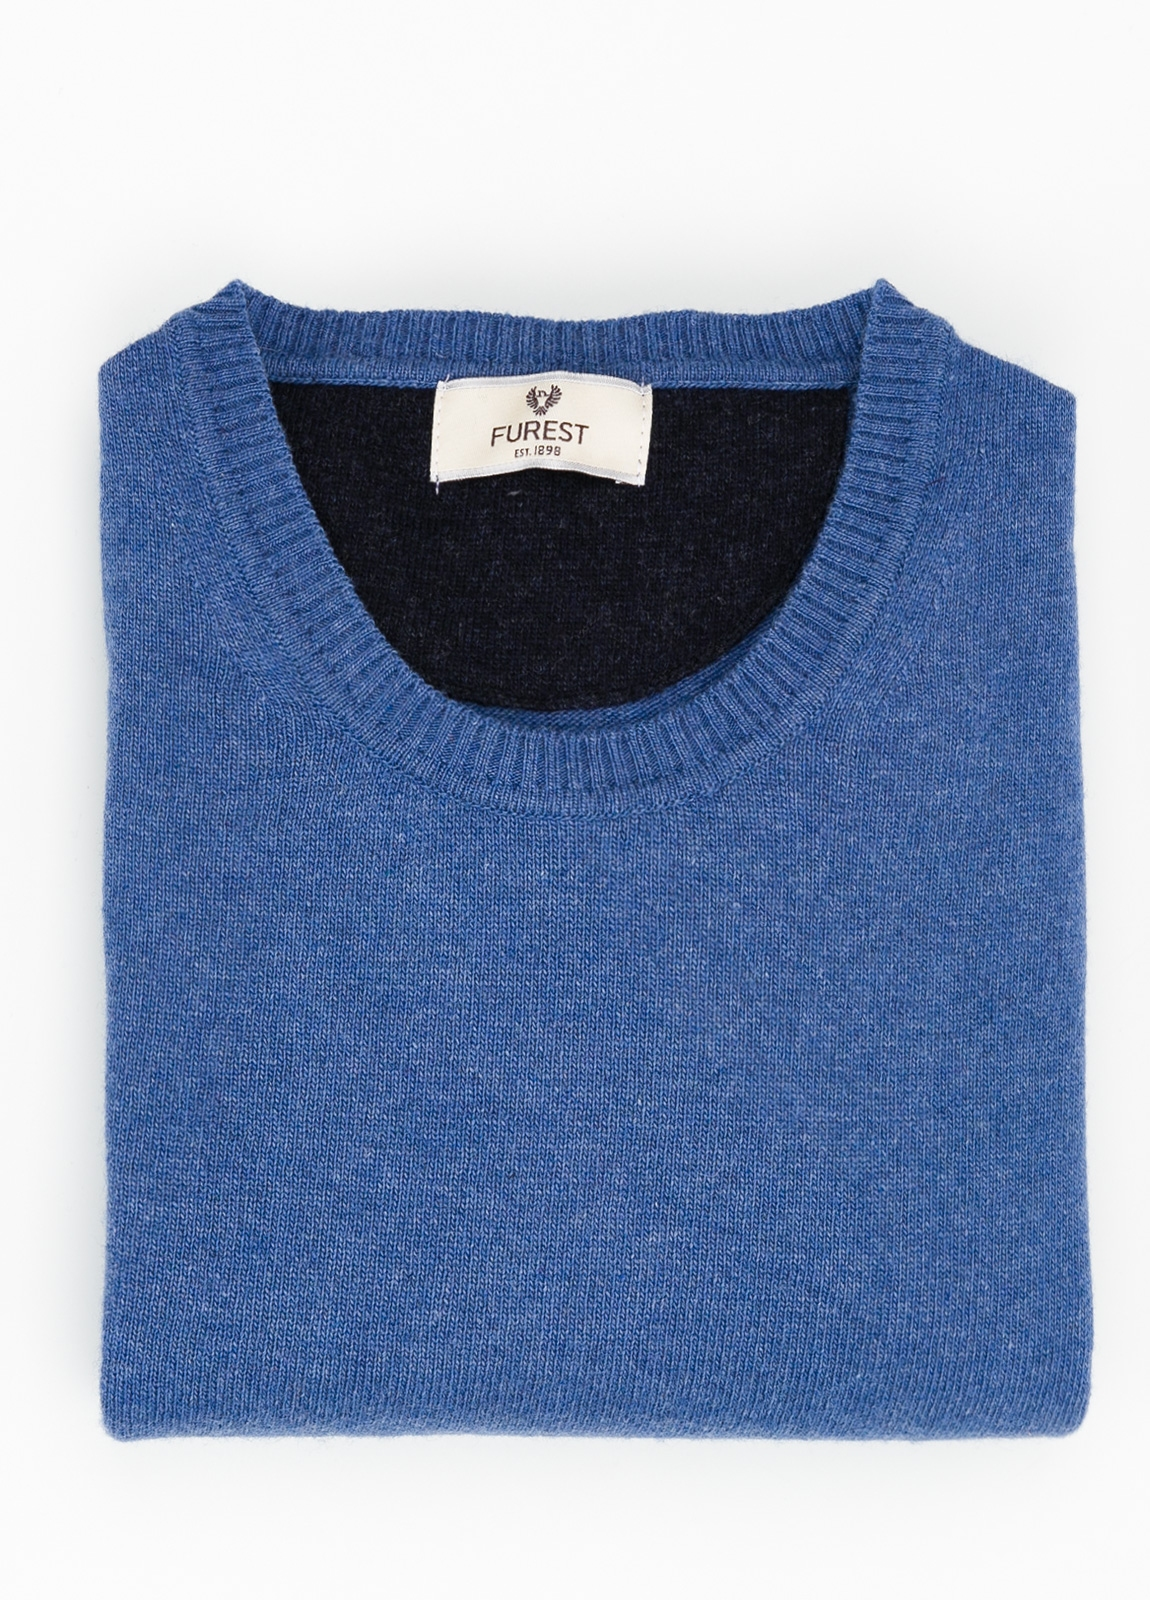 Jersey liso cuello redondo color azulón, 40% lana merino, 20% viscosa, 10% cachemire - Ítem1